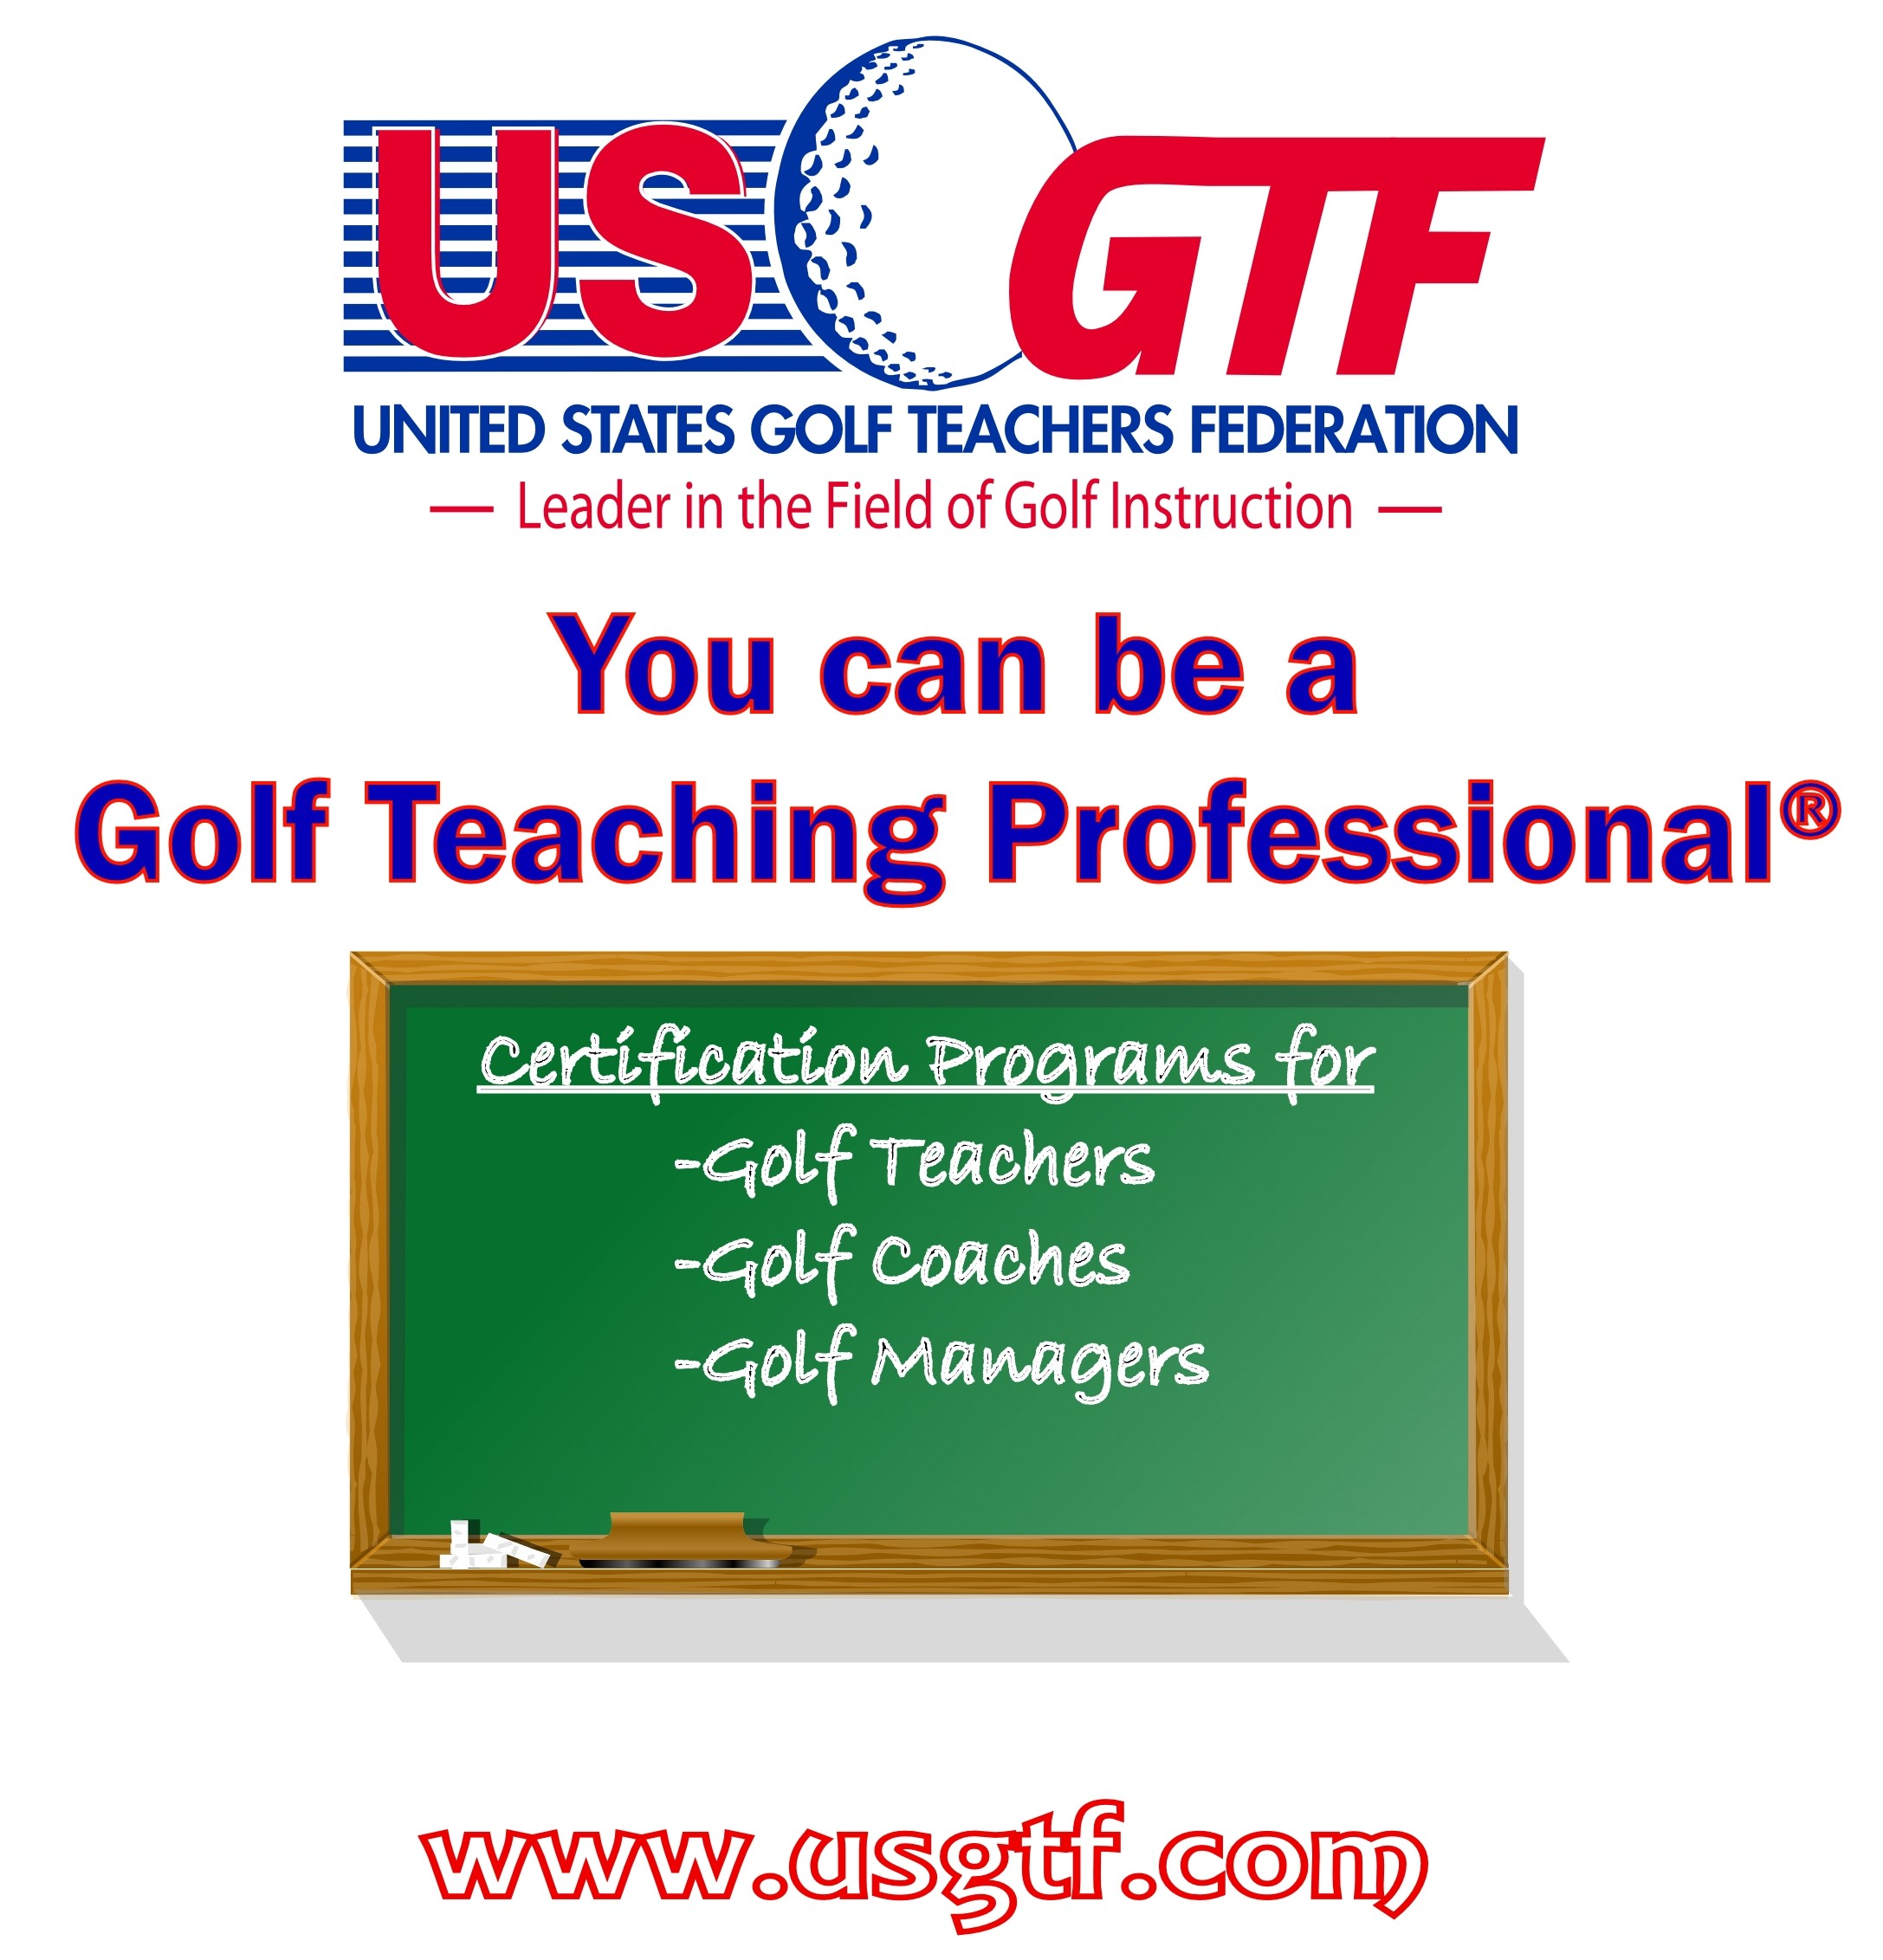 United States Golf Teachers Federation image 1